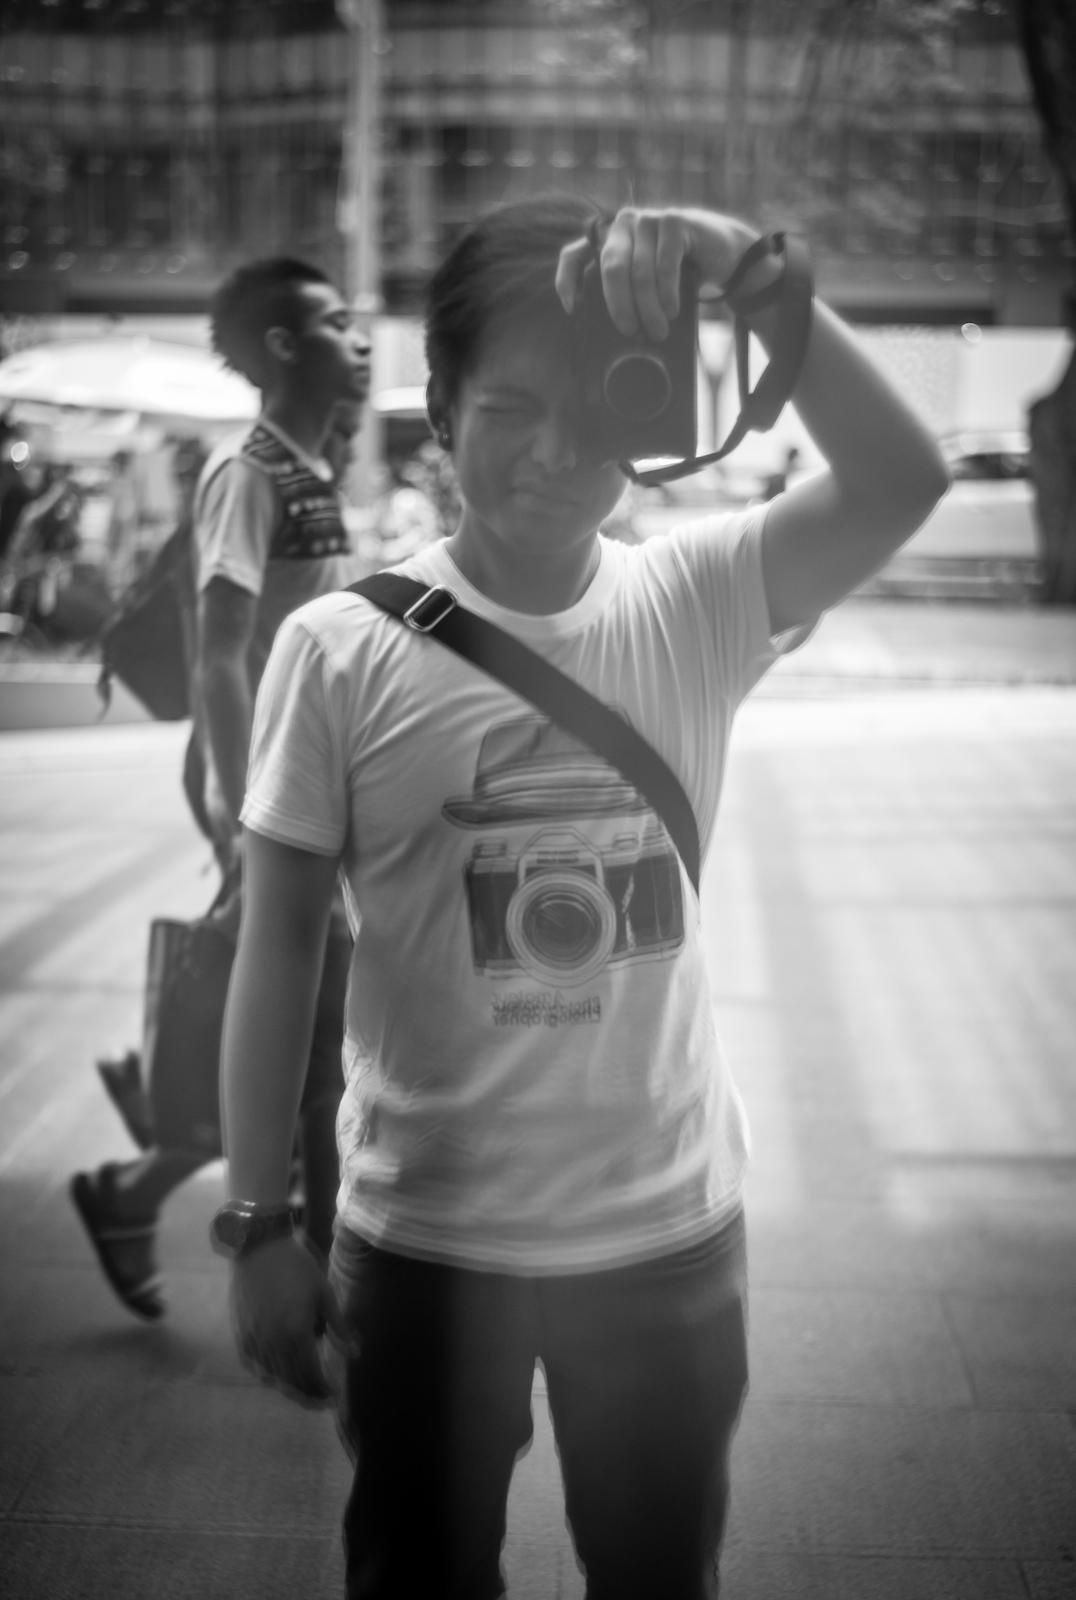 Photographer's self-portrait